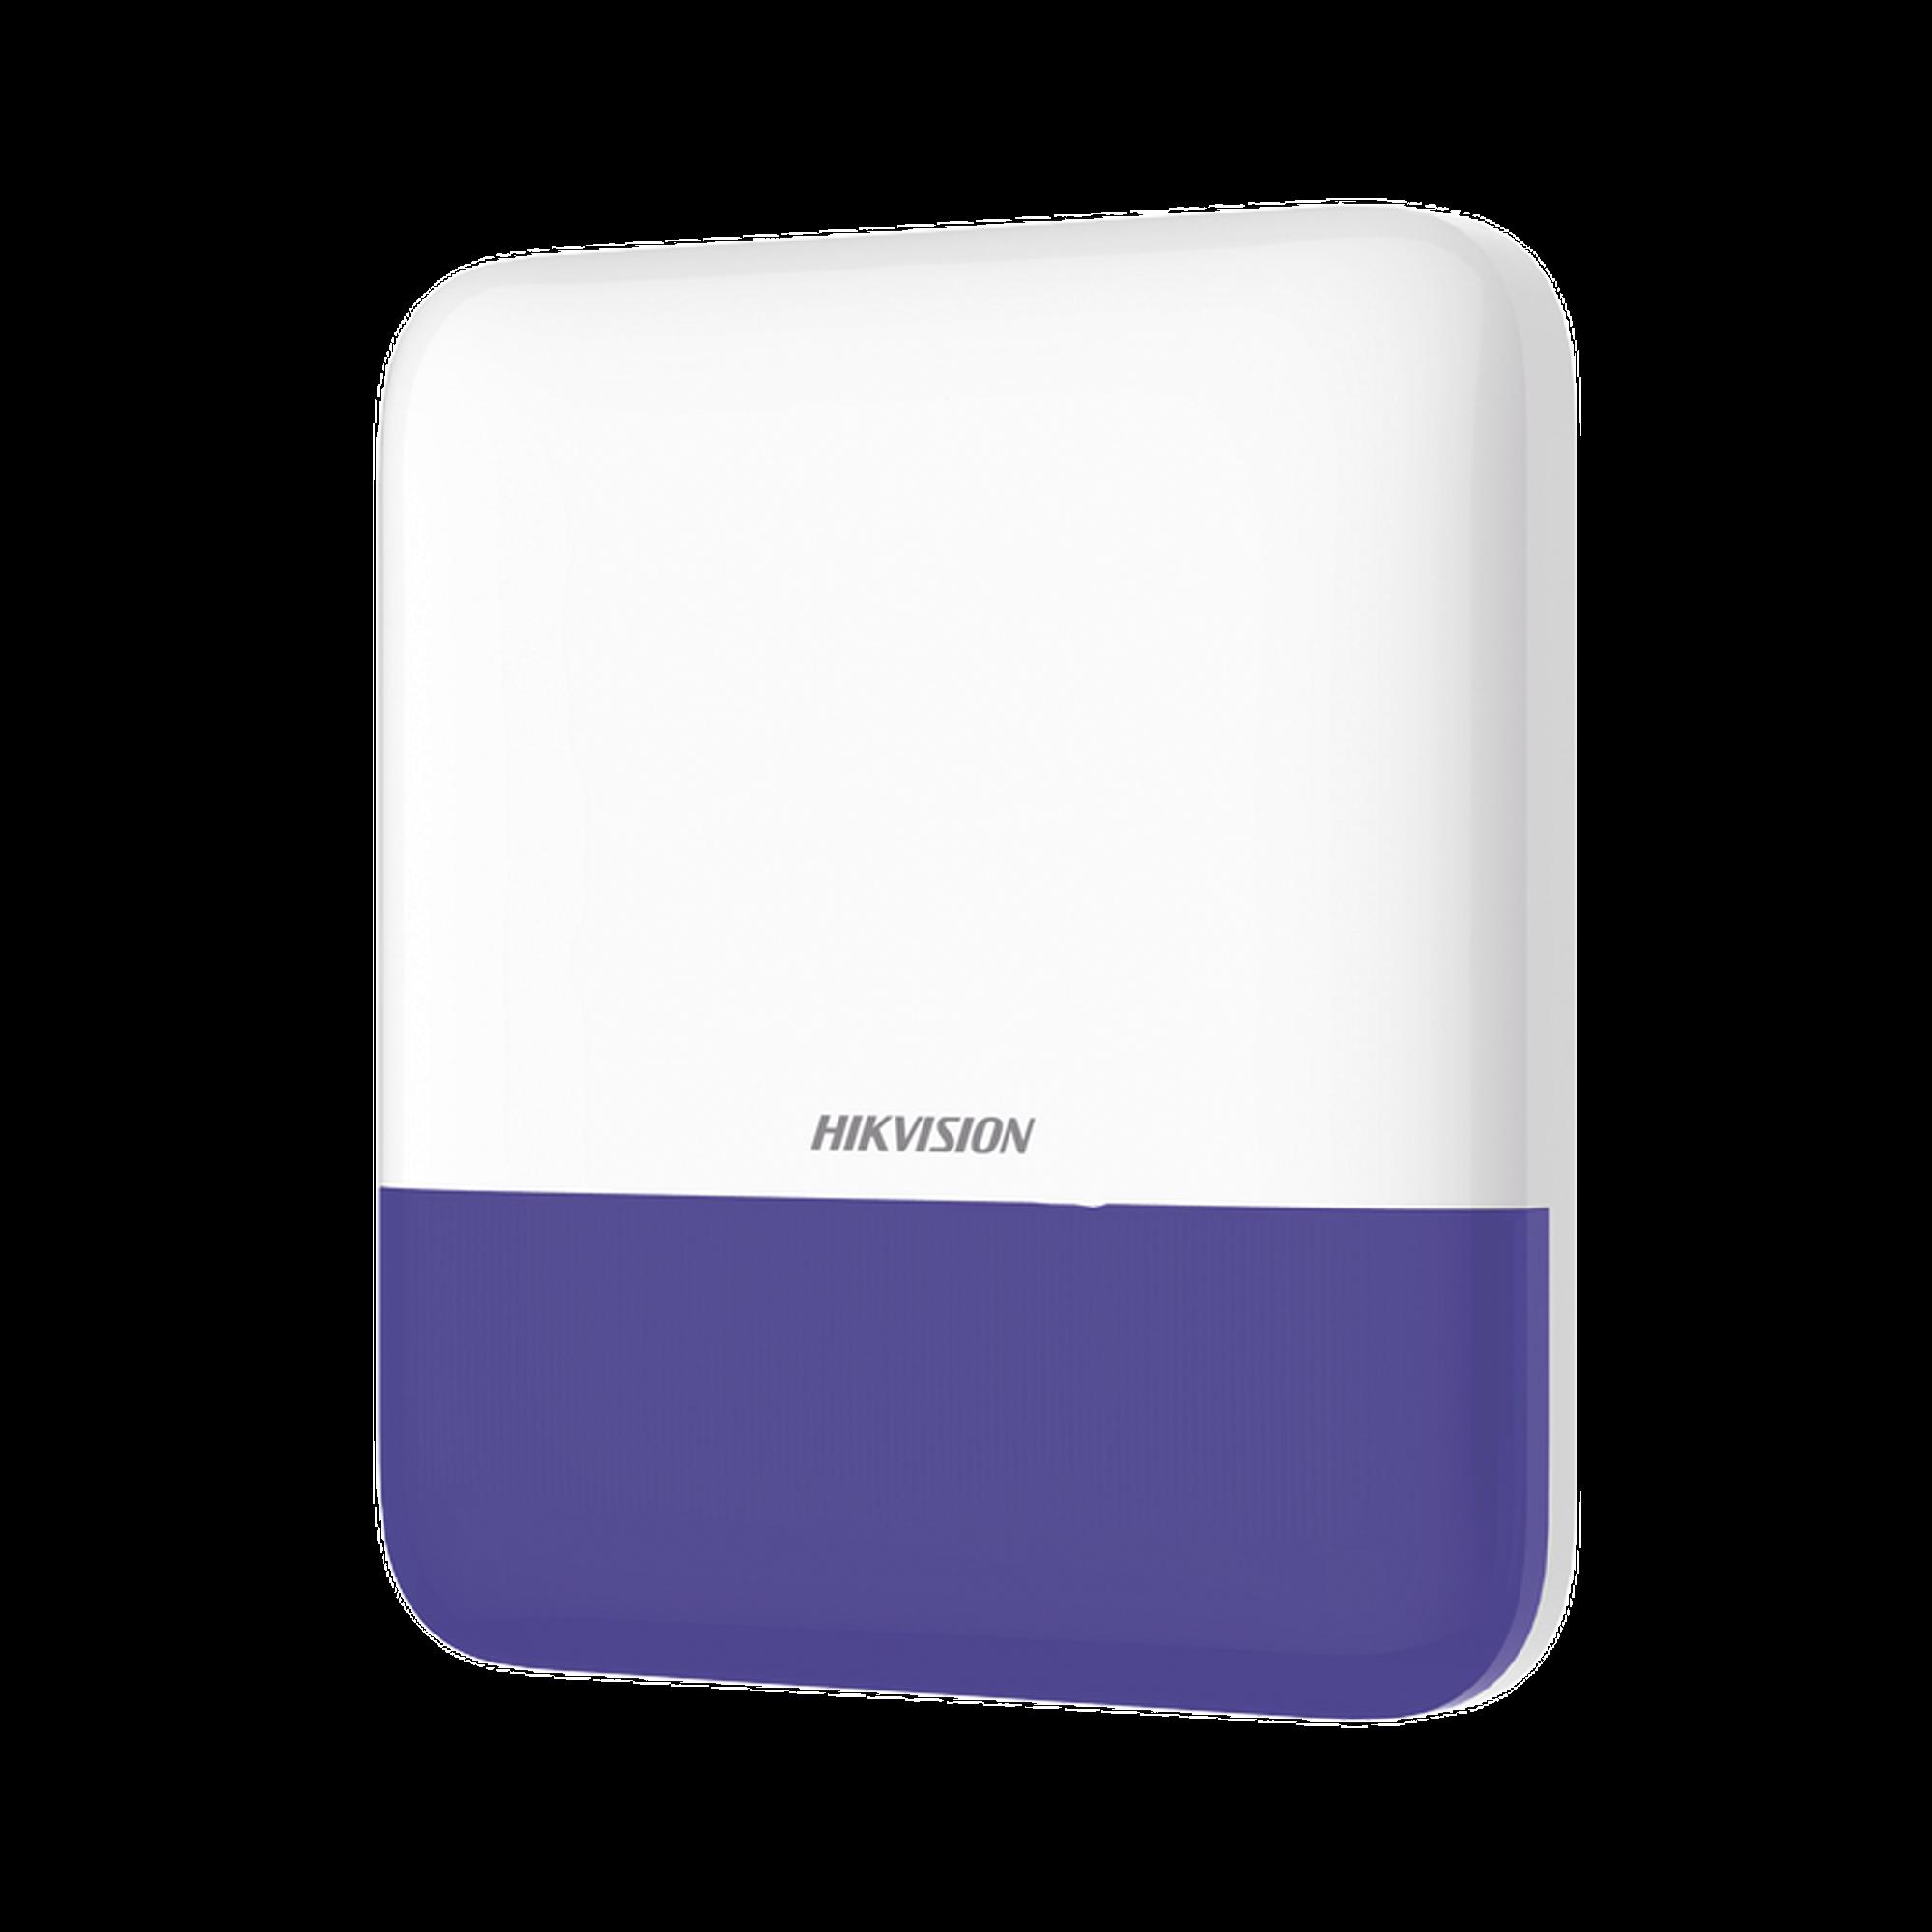 (AX PRO) Sirena Inalámbrica con Estrobo Azul para Exterior IP65 / 110 dB